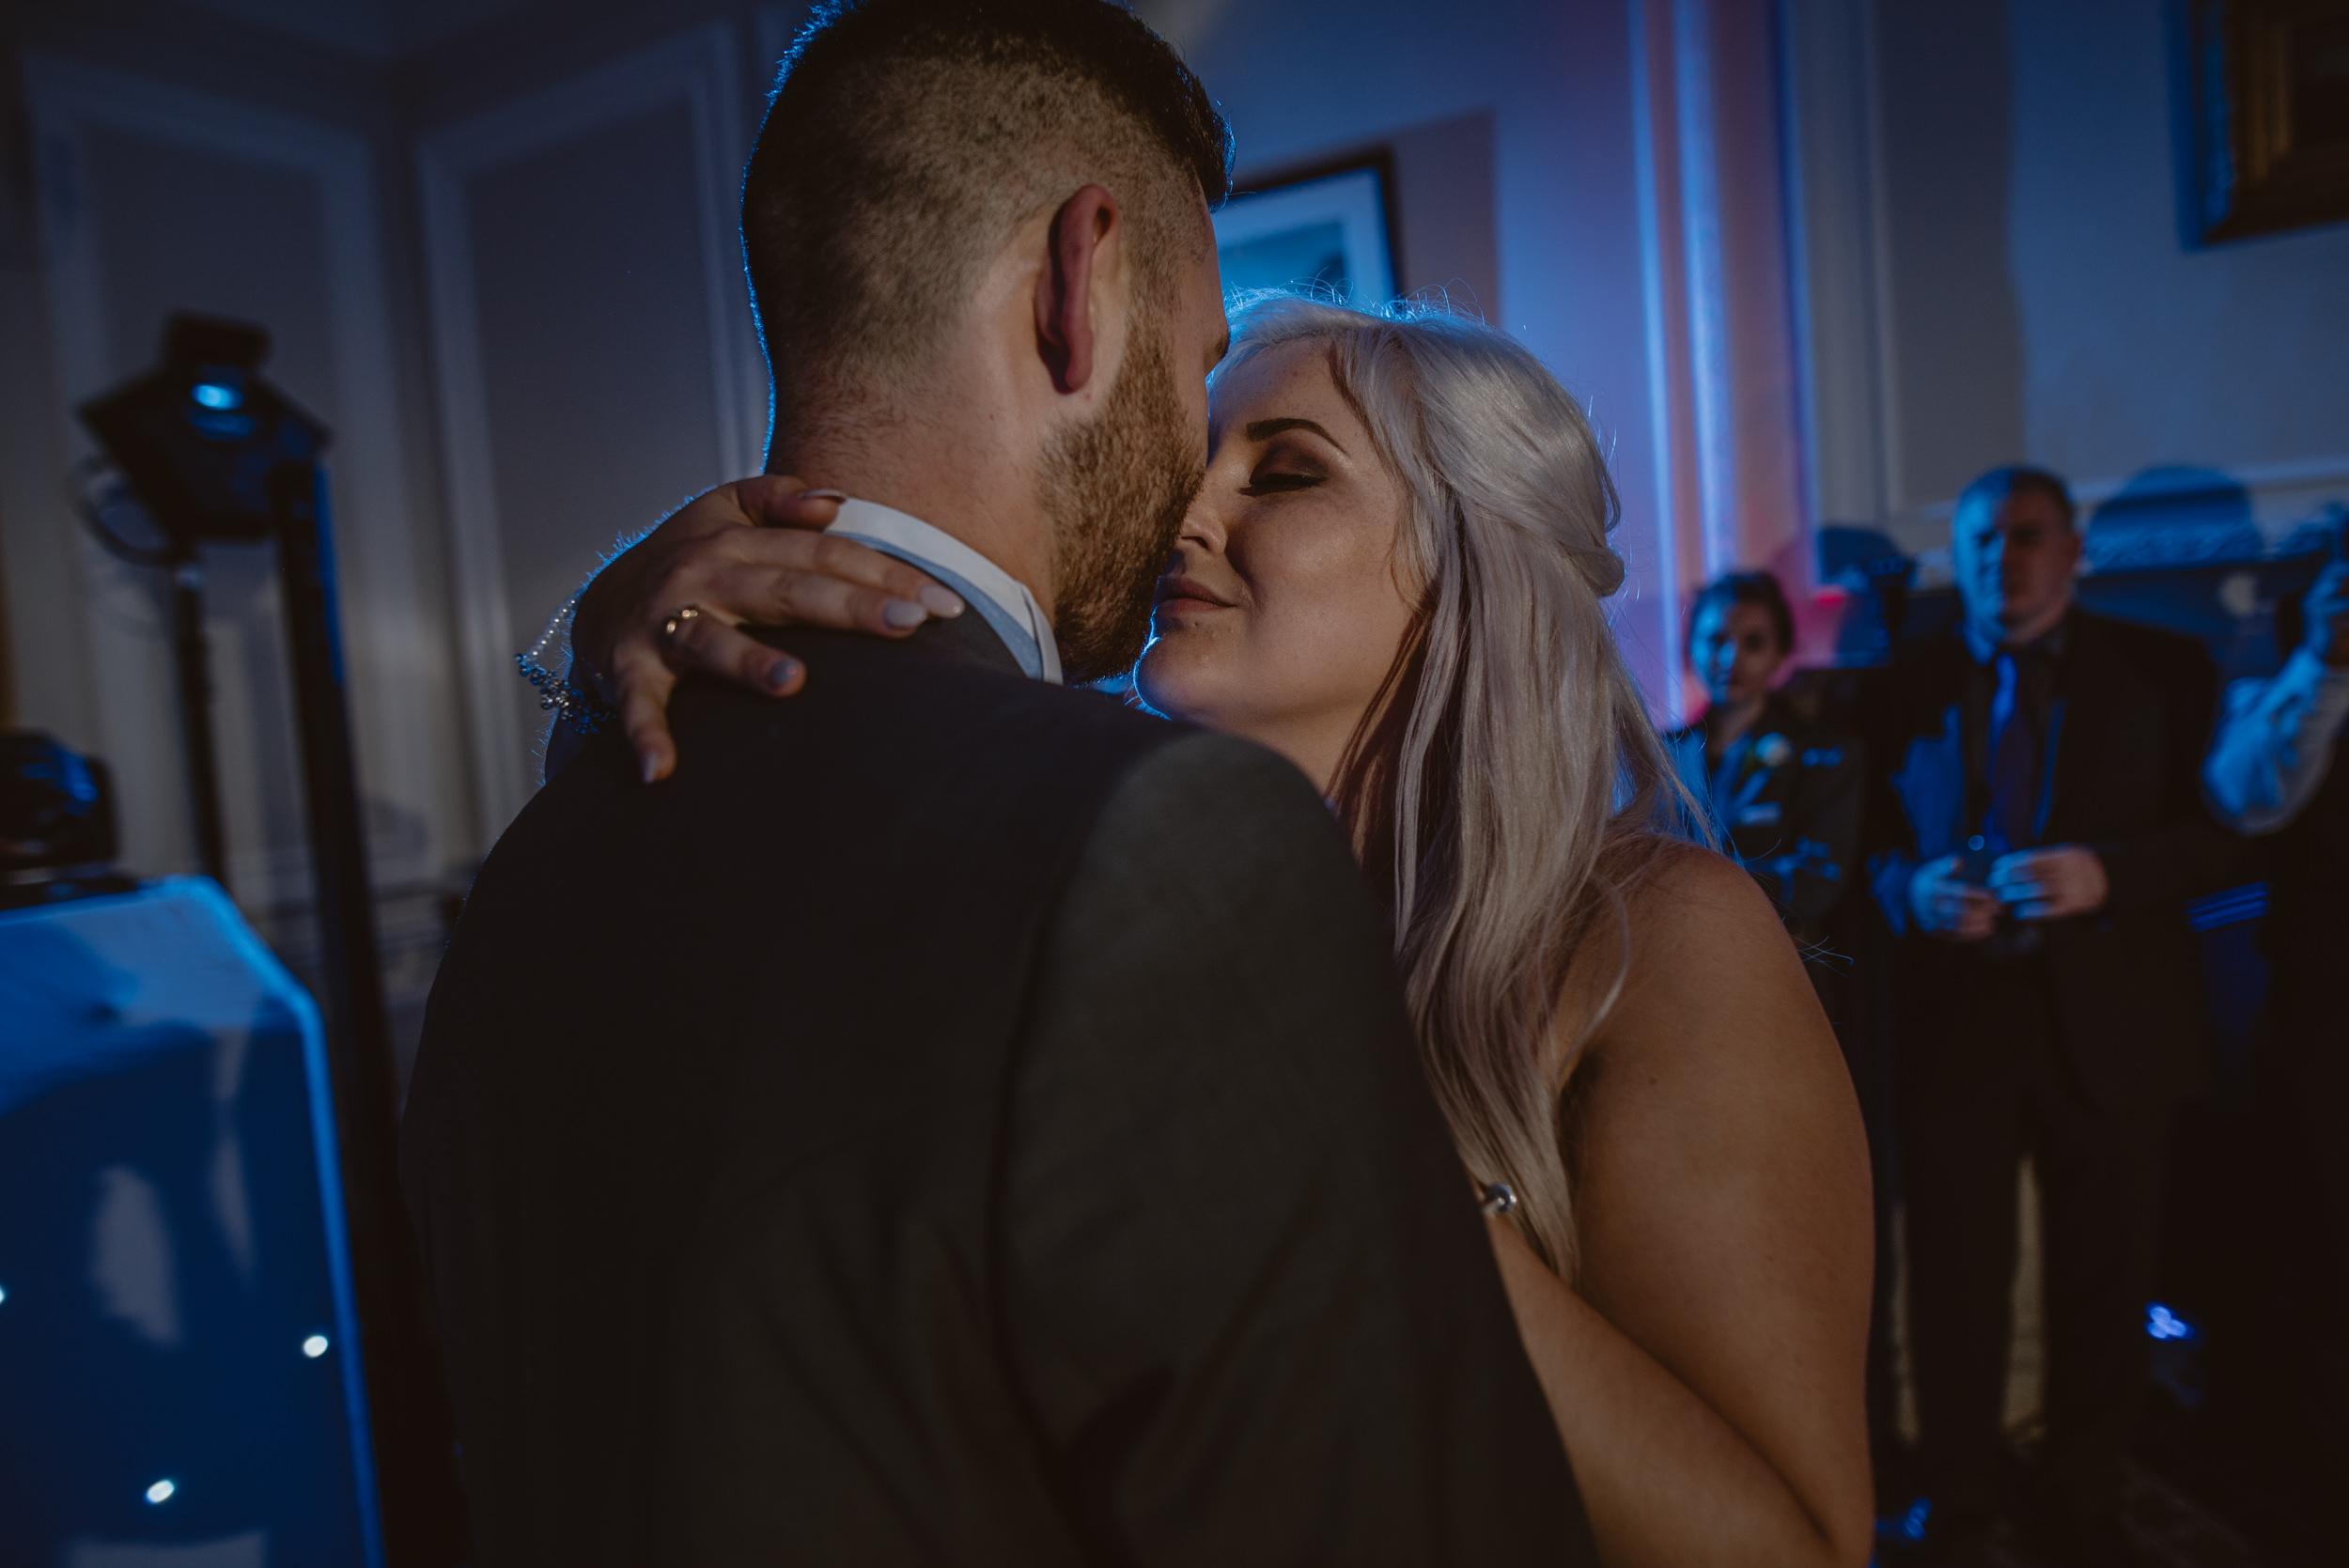 Rachel-and-James-Wedding-Horsley-Towers-State-Manu-Mendoza-Wedding-Photography-522.jpg